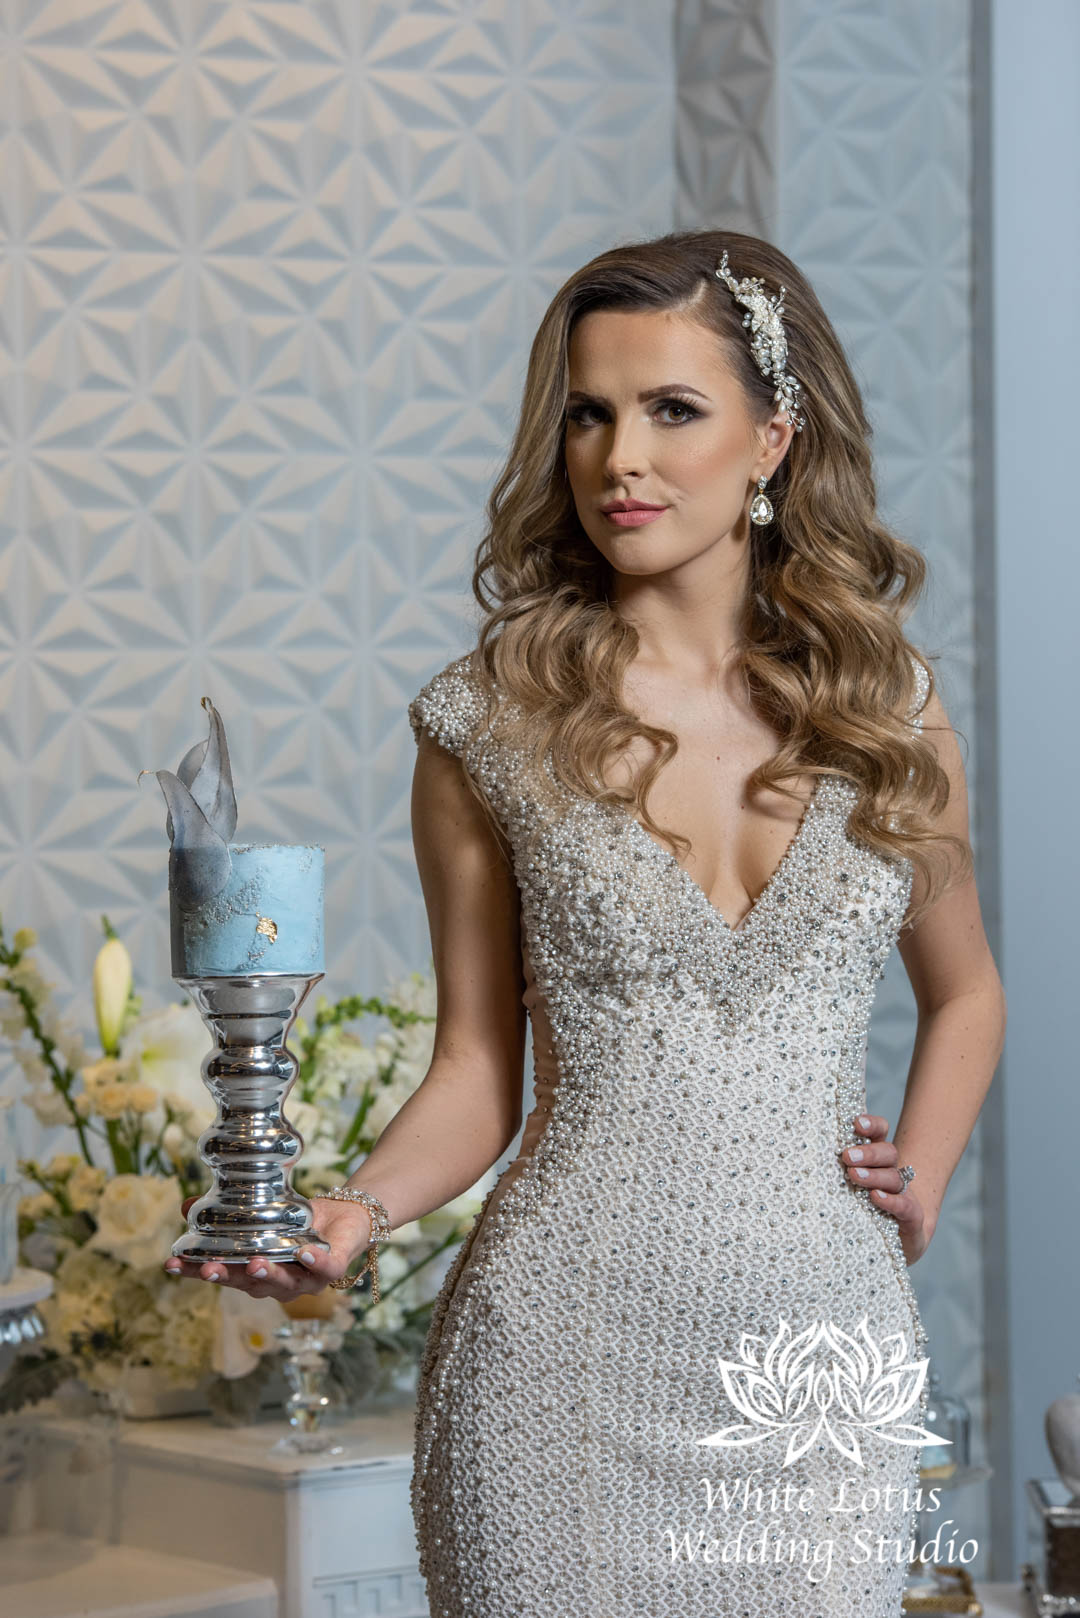 127- GLAM WINTERLUXE WEDDING INSPIRATION